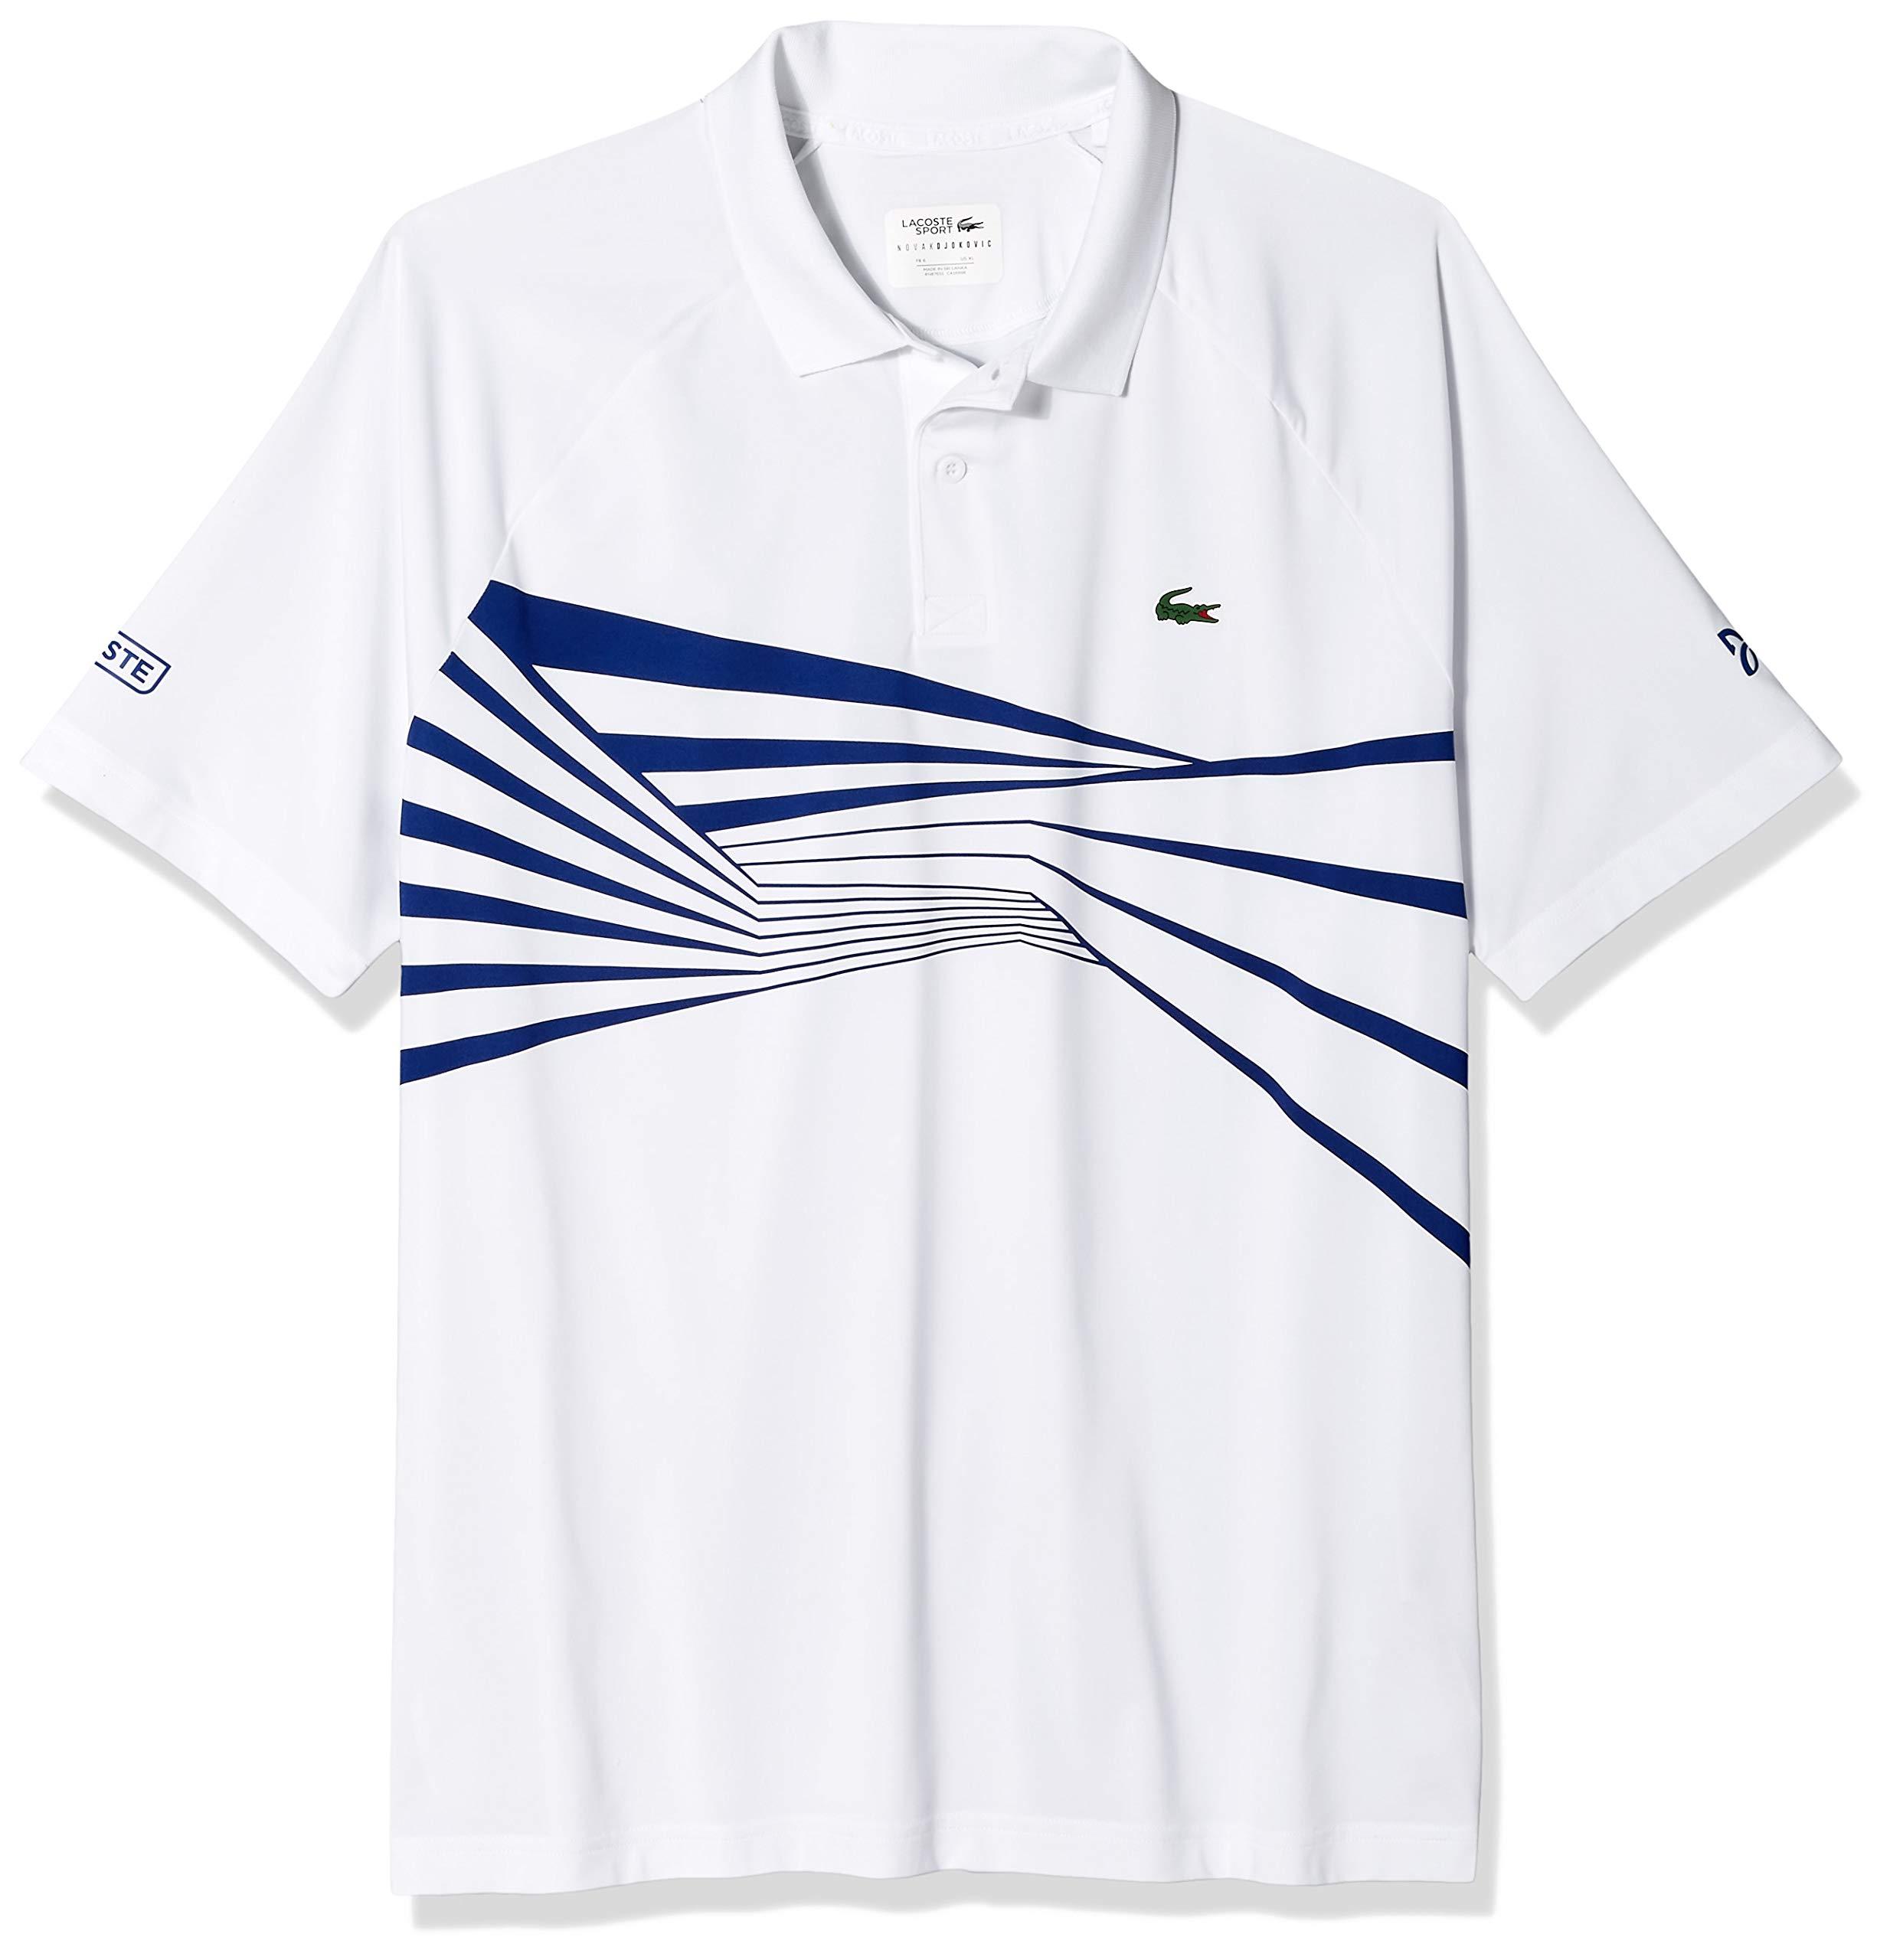 Lacoste Men's Sport DJOVOKIC Short Sleeve Ultra Dry